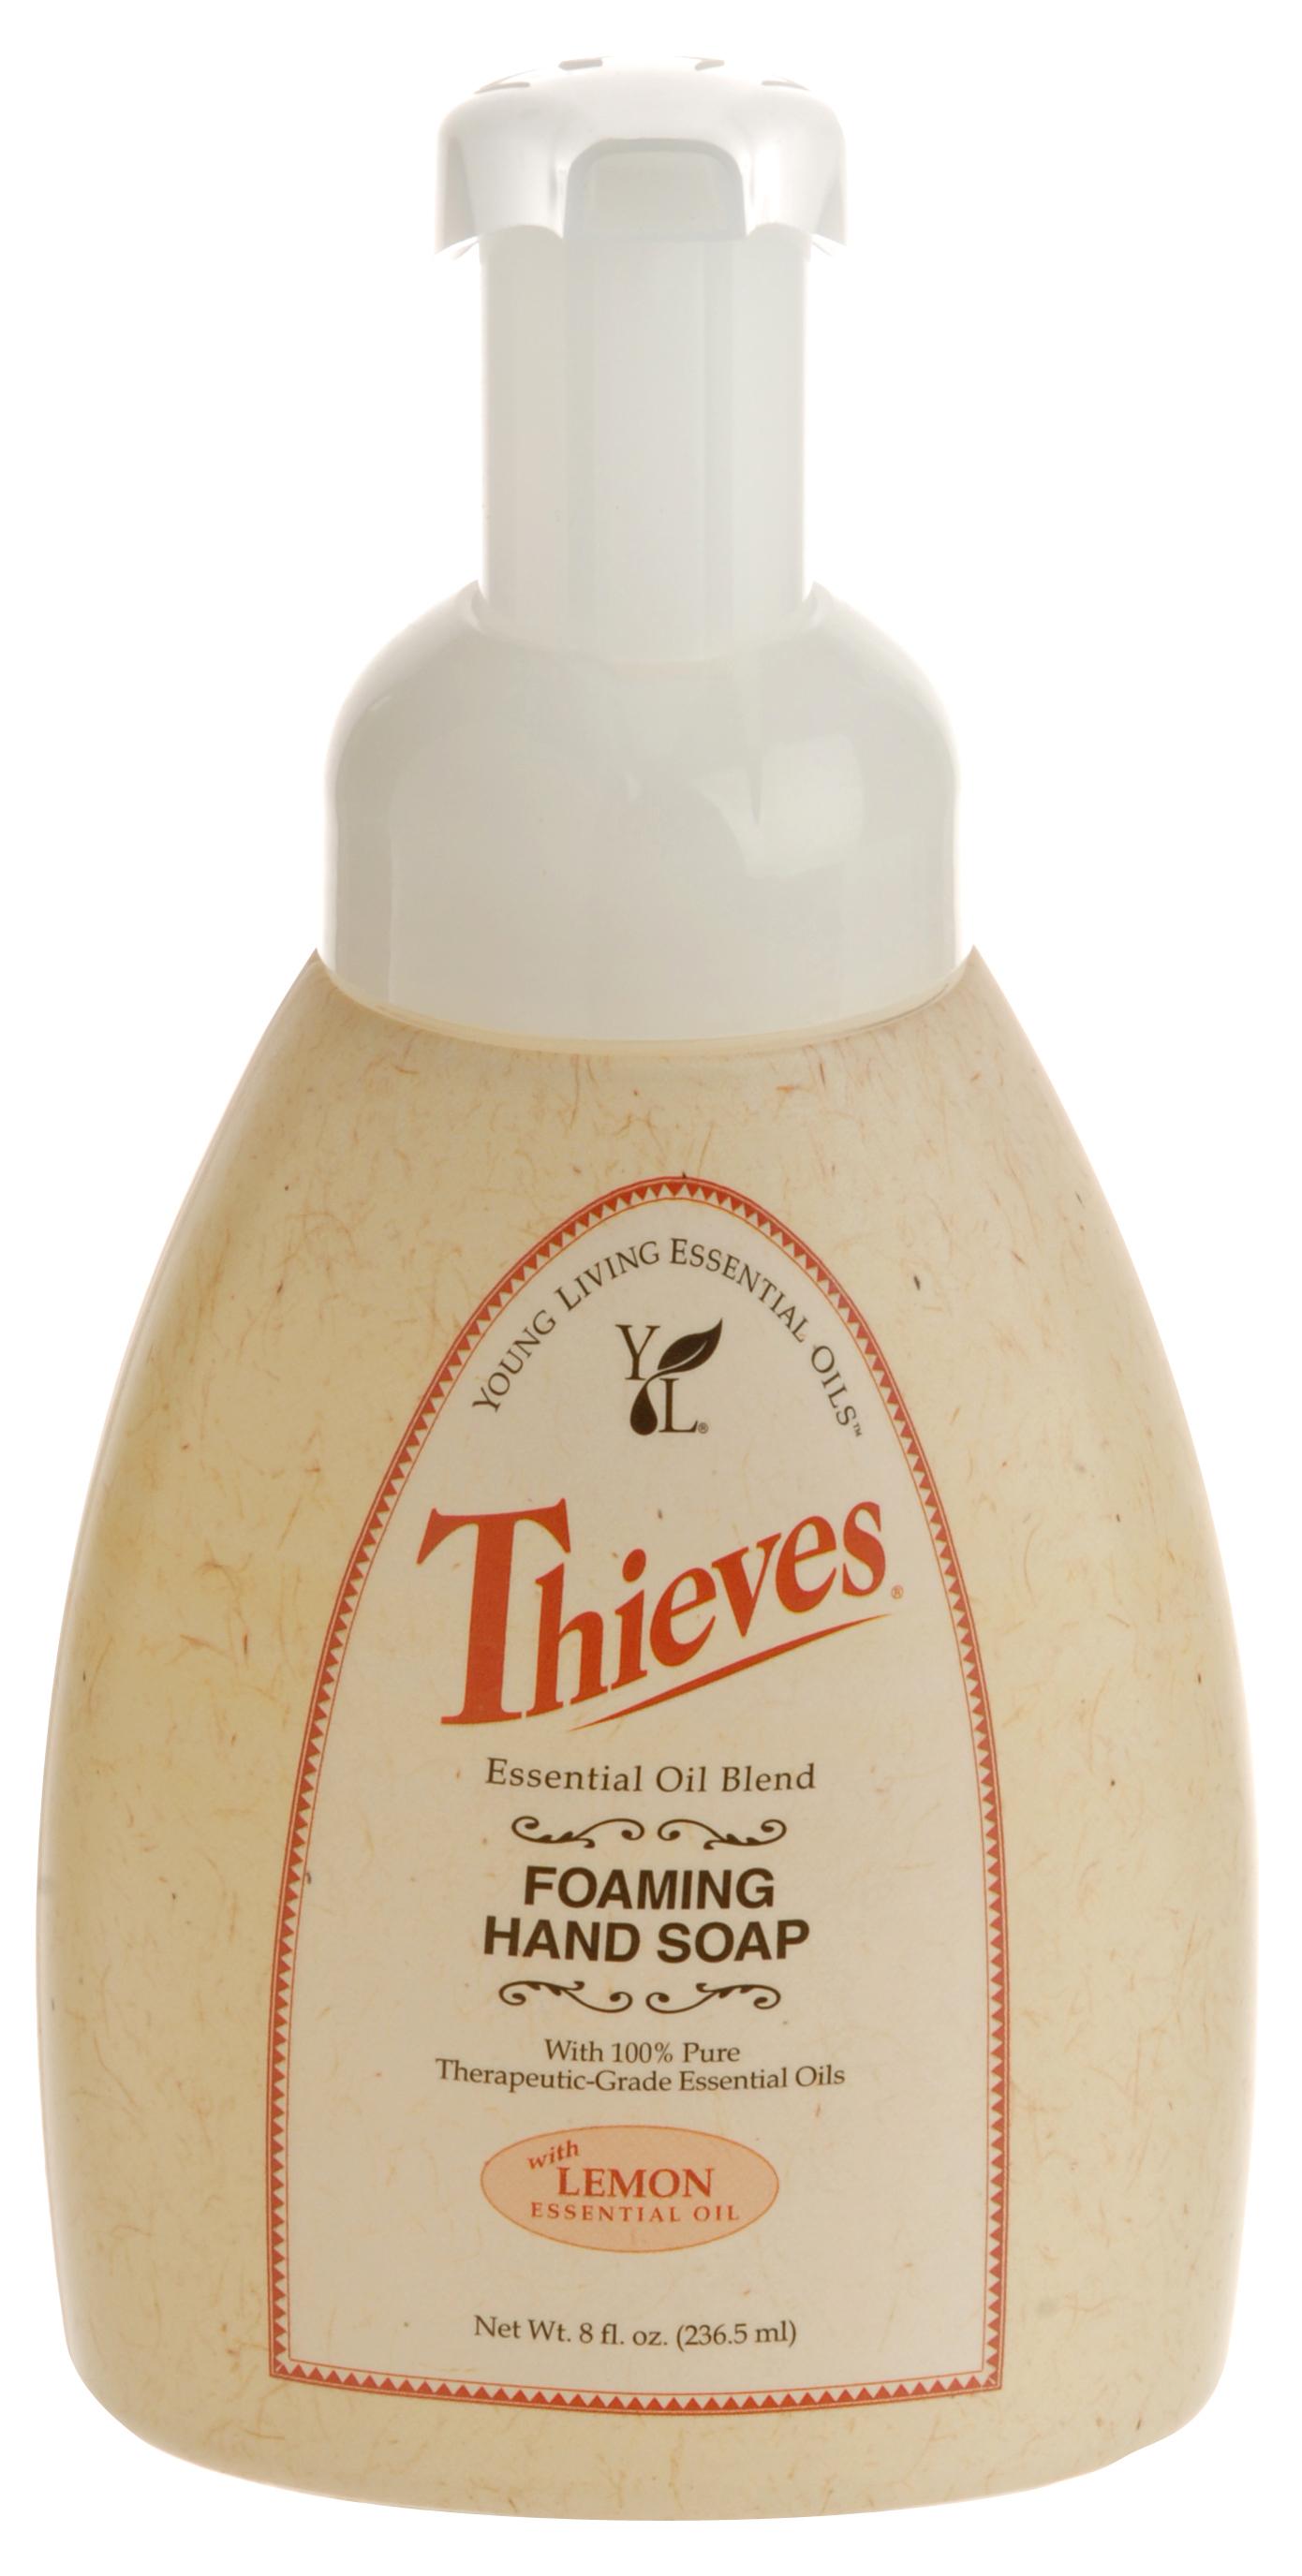 Thieves Foaming Hand Soap.jpg